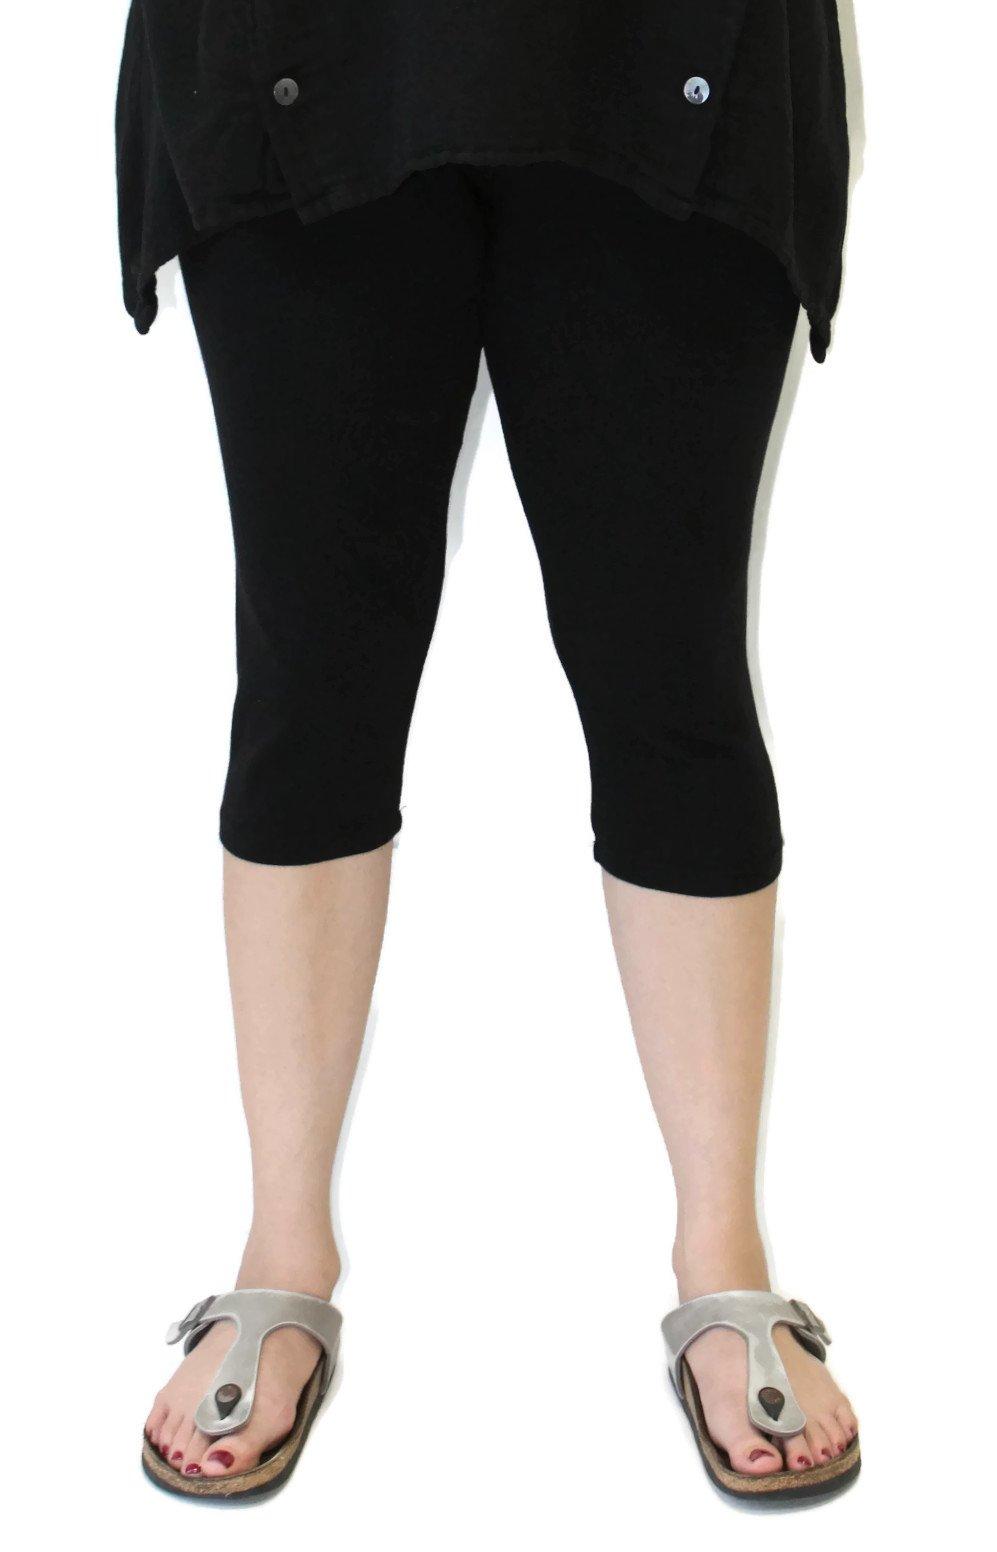 Prairie Cotton Women's Stretch Cotton Capri Leggings (XXL, Black)